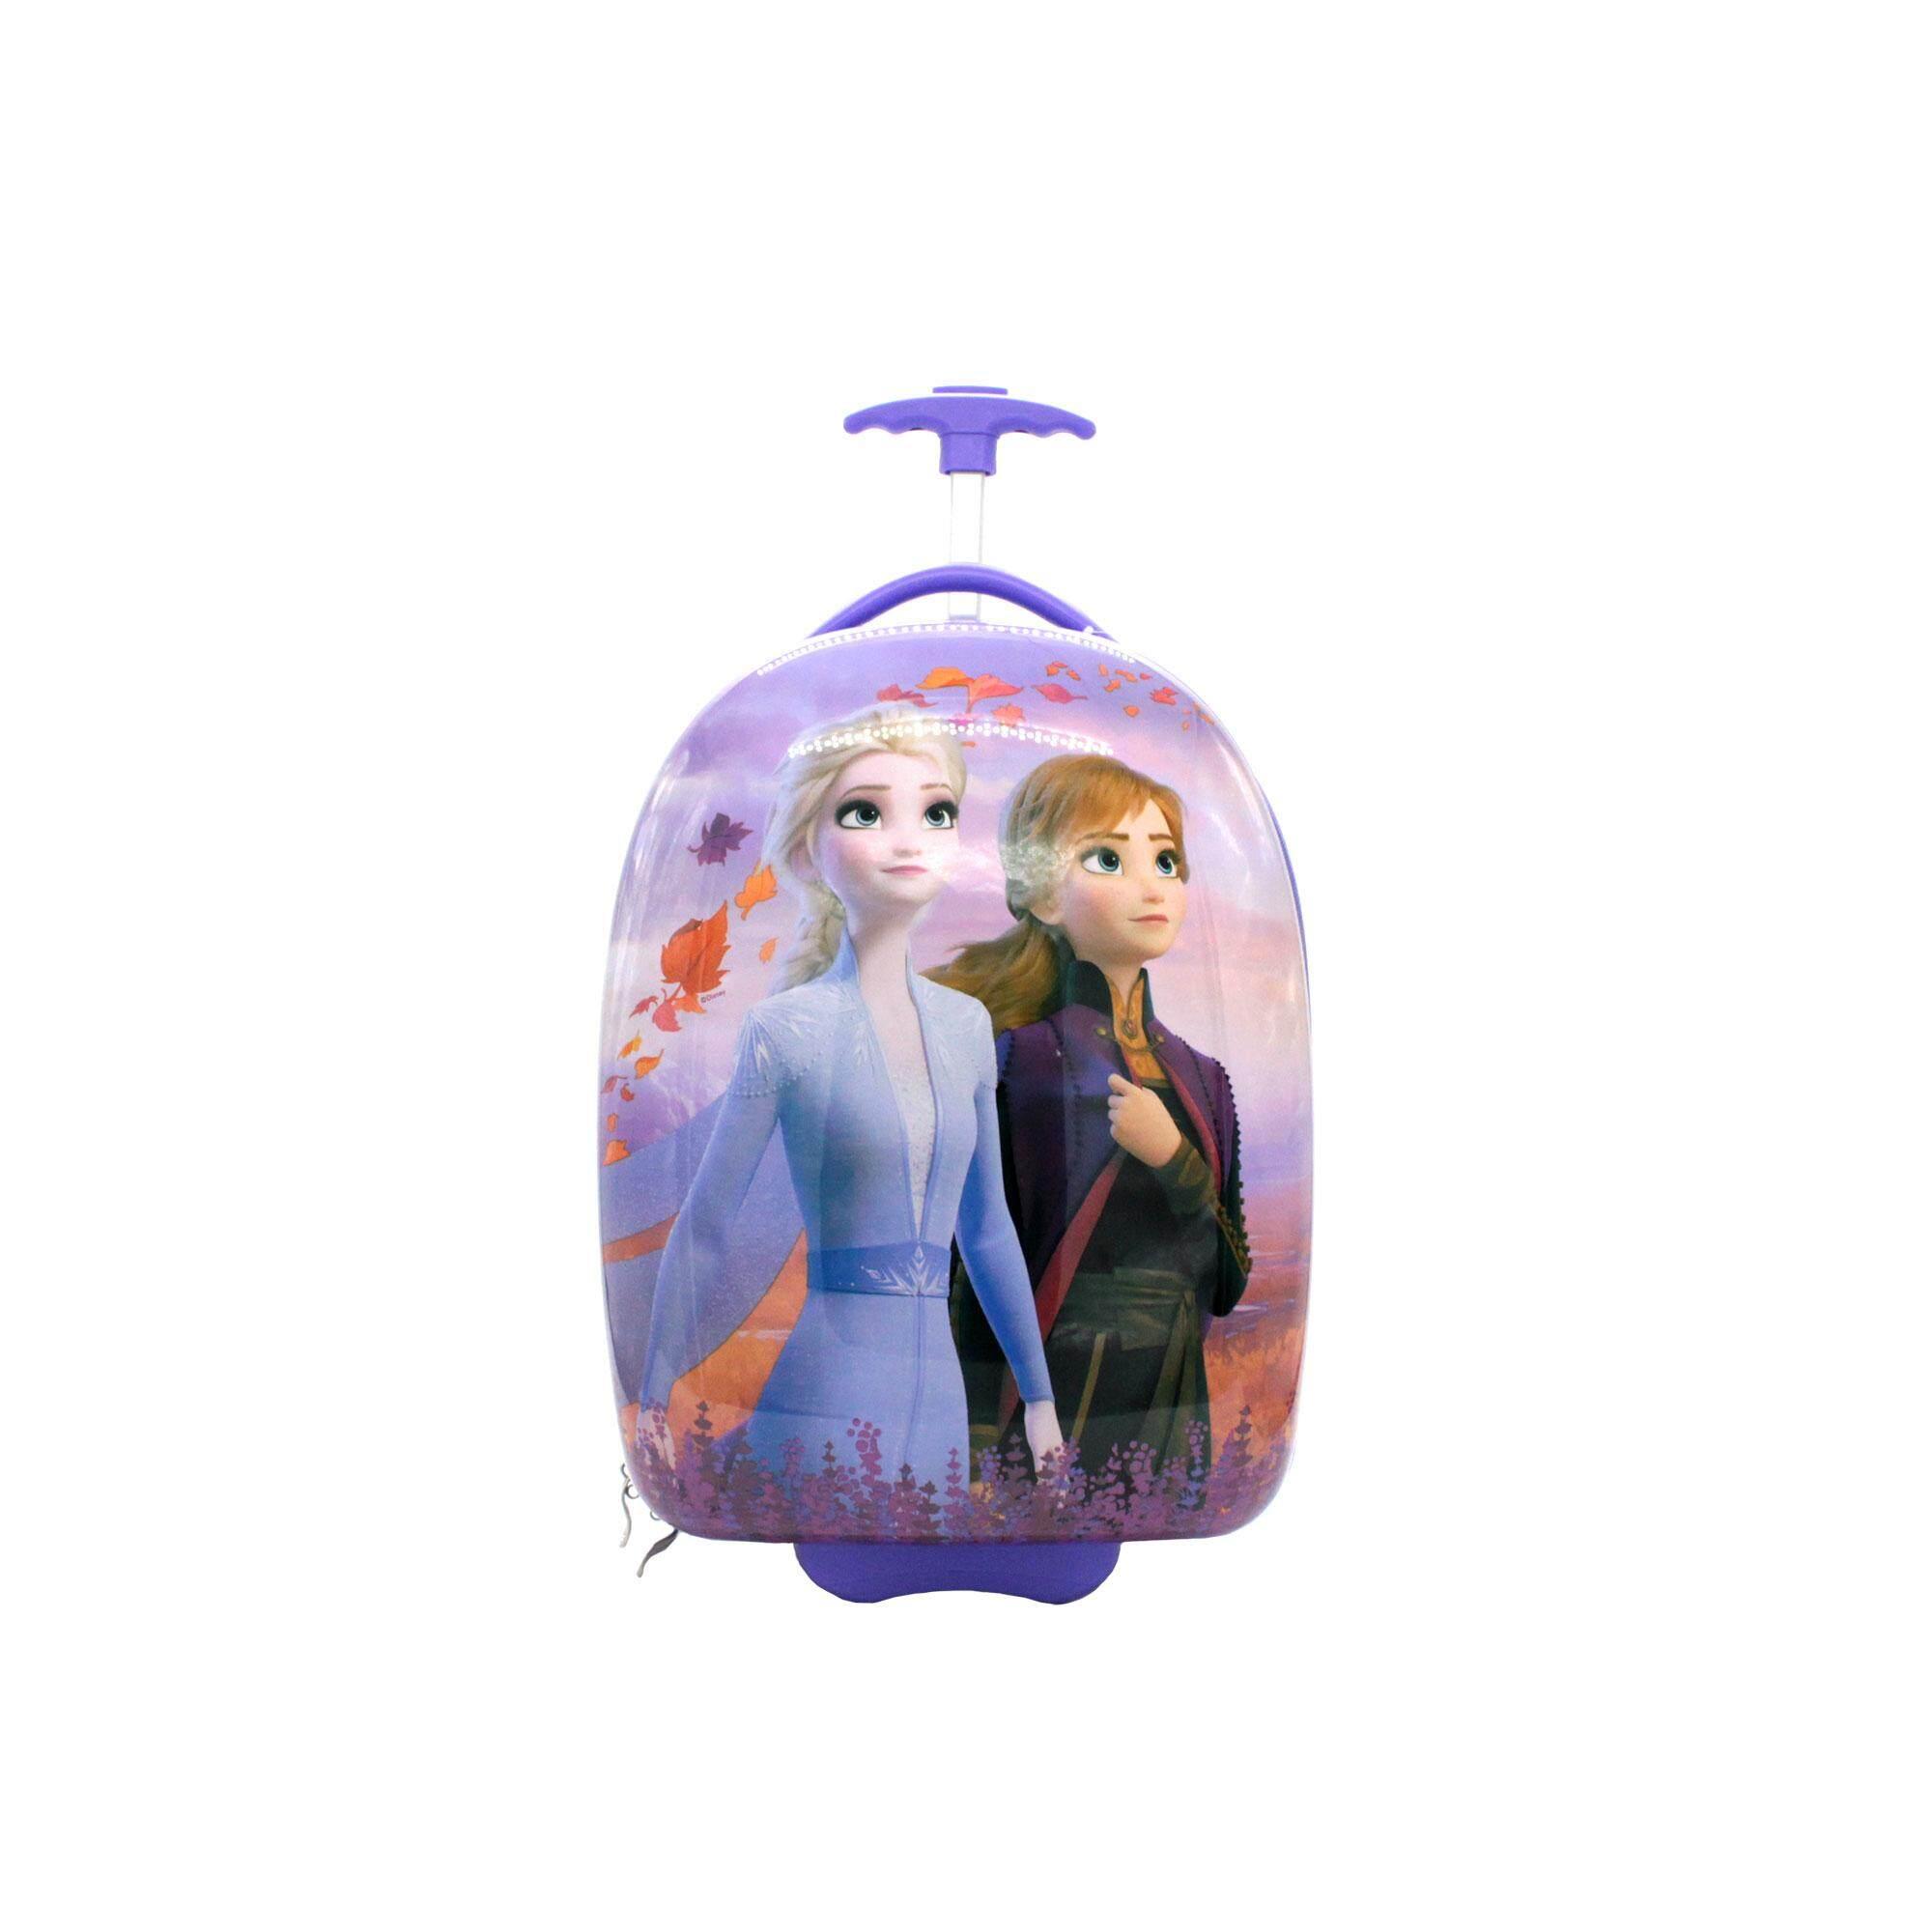 Disney Princess Frozen 2 : 18 Inches Round Shape Luggage - Elsa & Anna